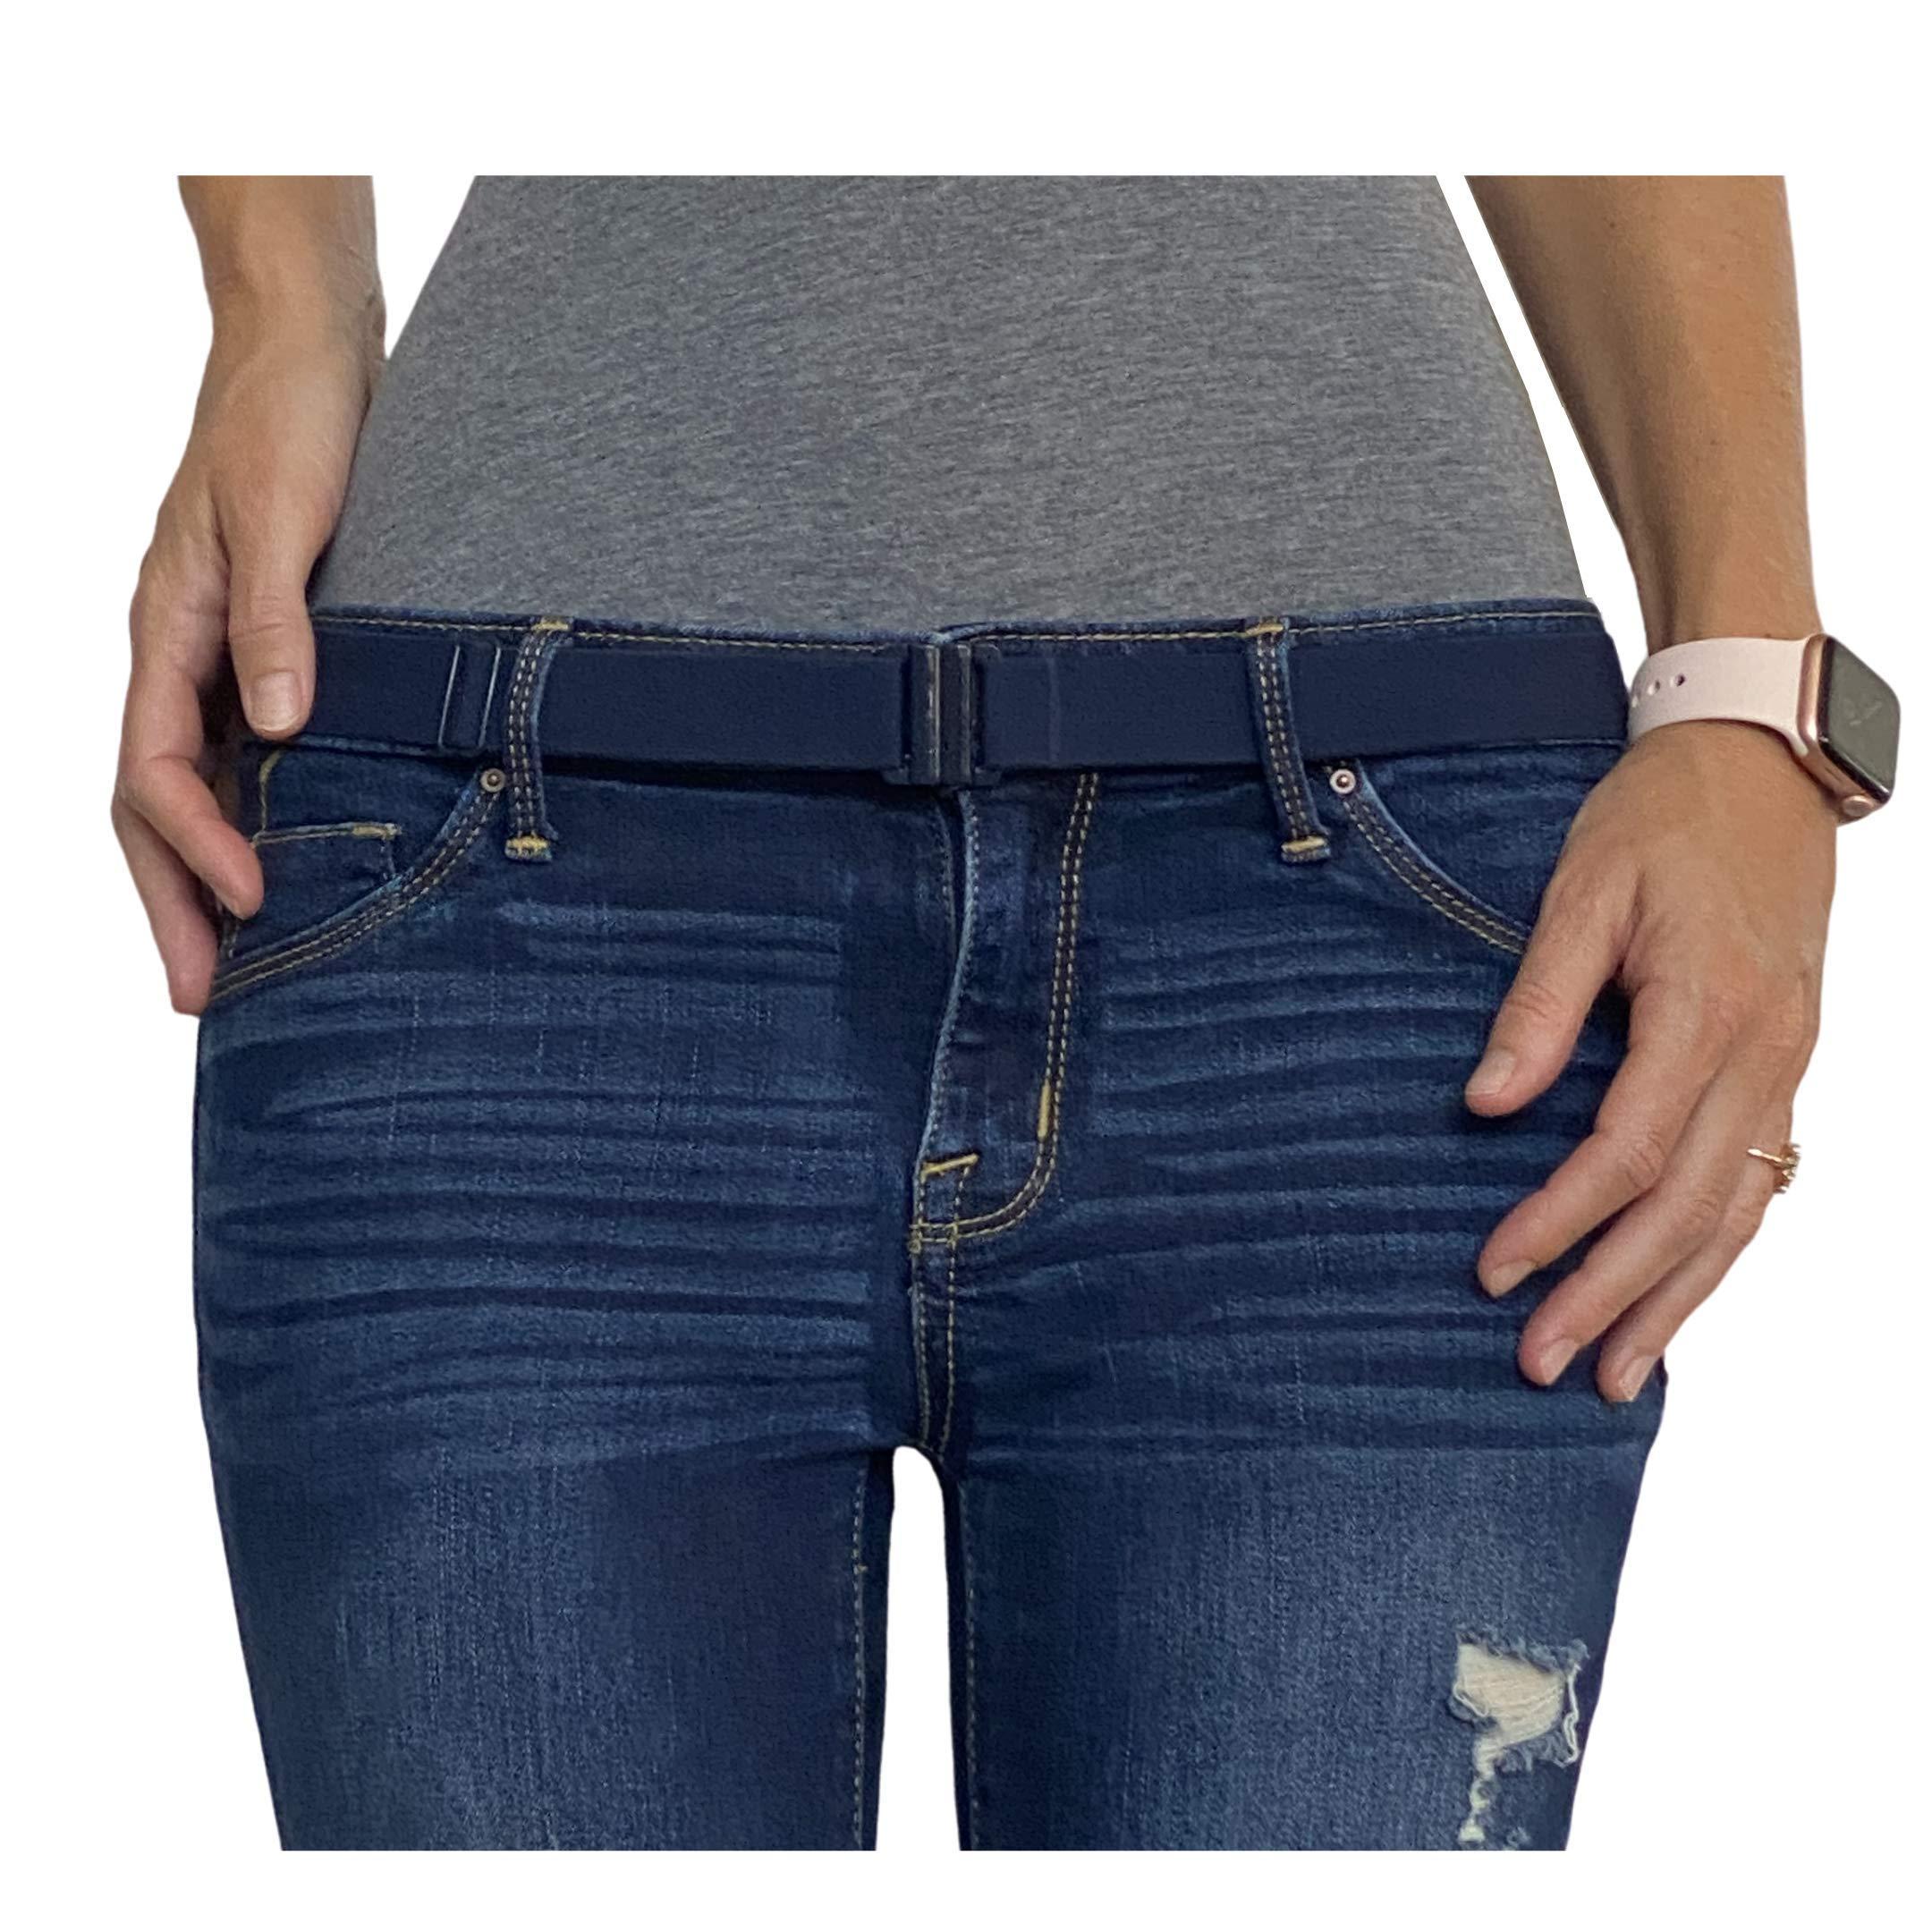 No Show Flat Buckle Ladies Belts Non- Slip Backing Black Belts for Women Adjustable Stretch Elastic Belt Women